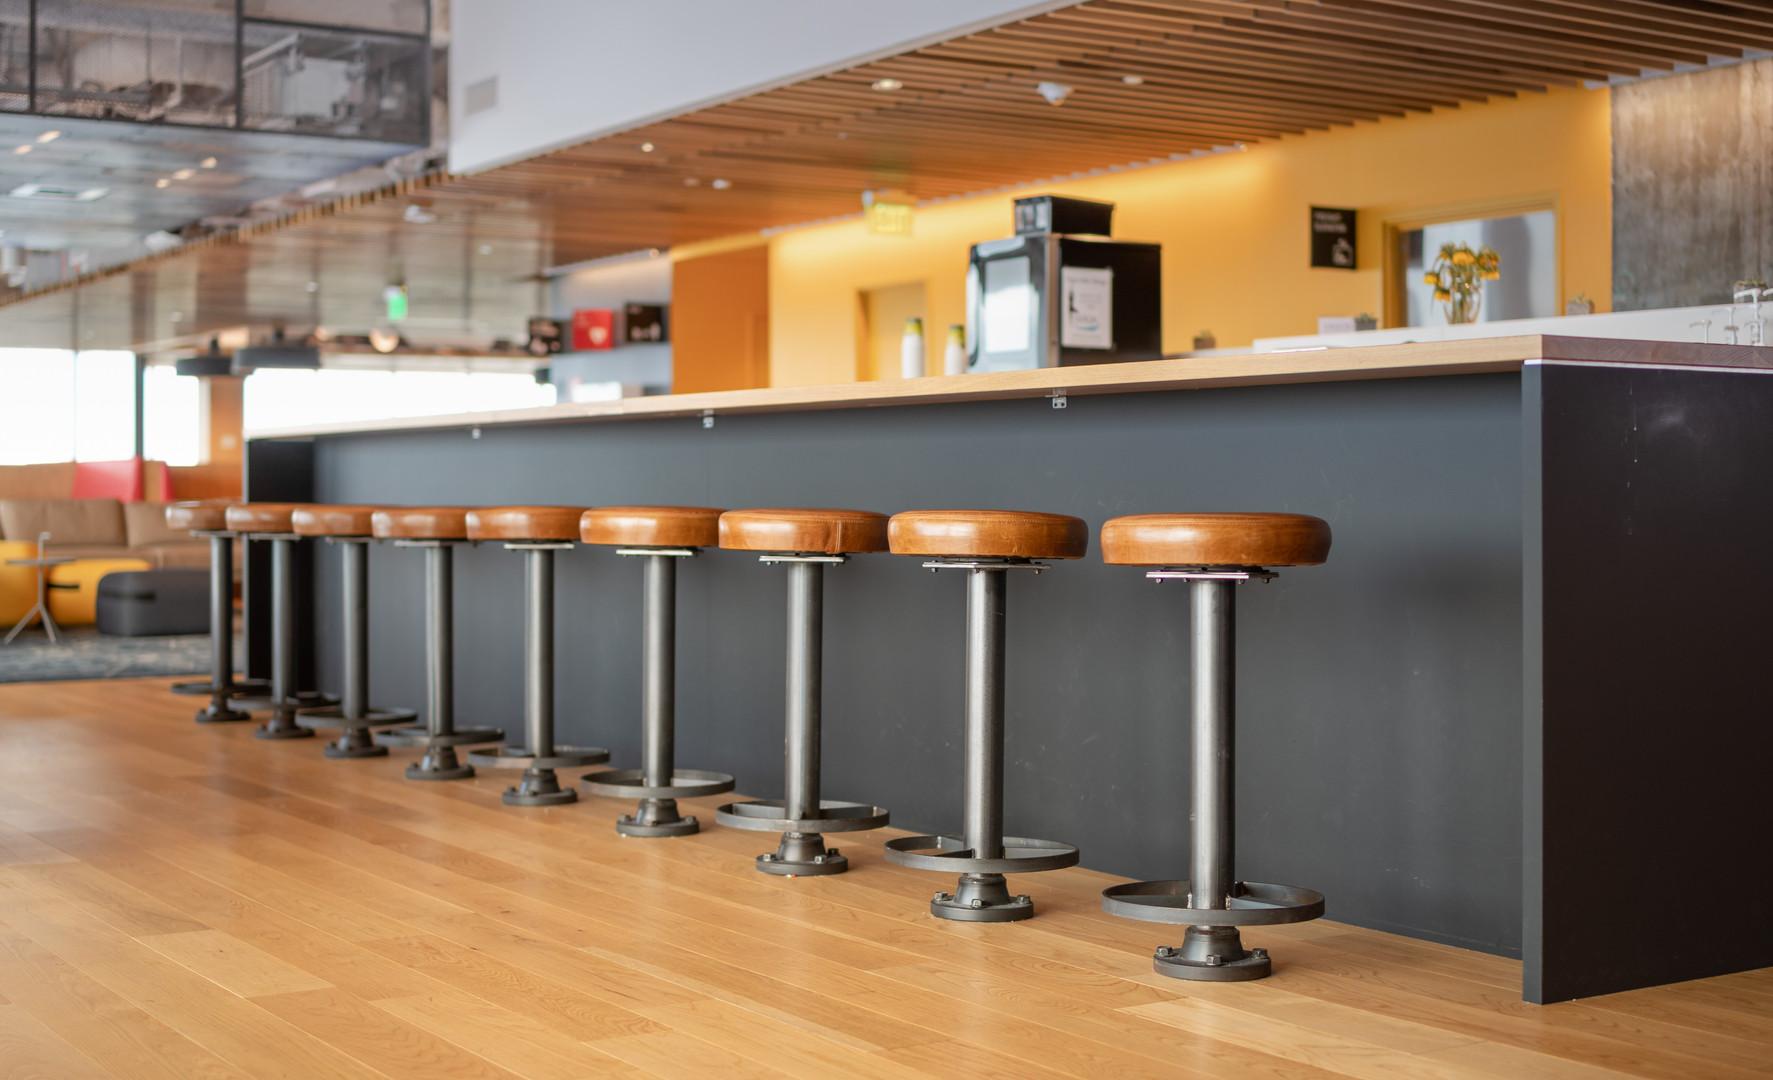 Leather bar stools